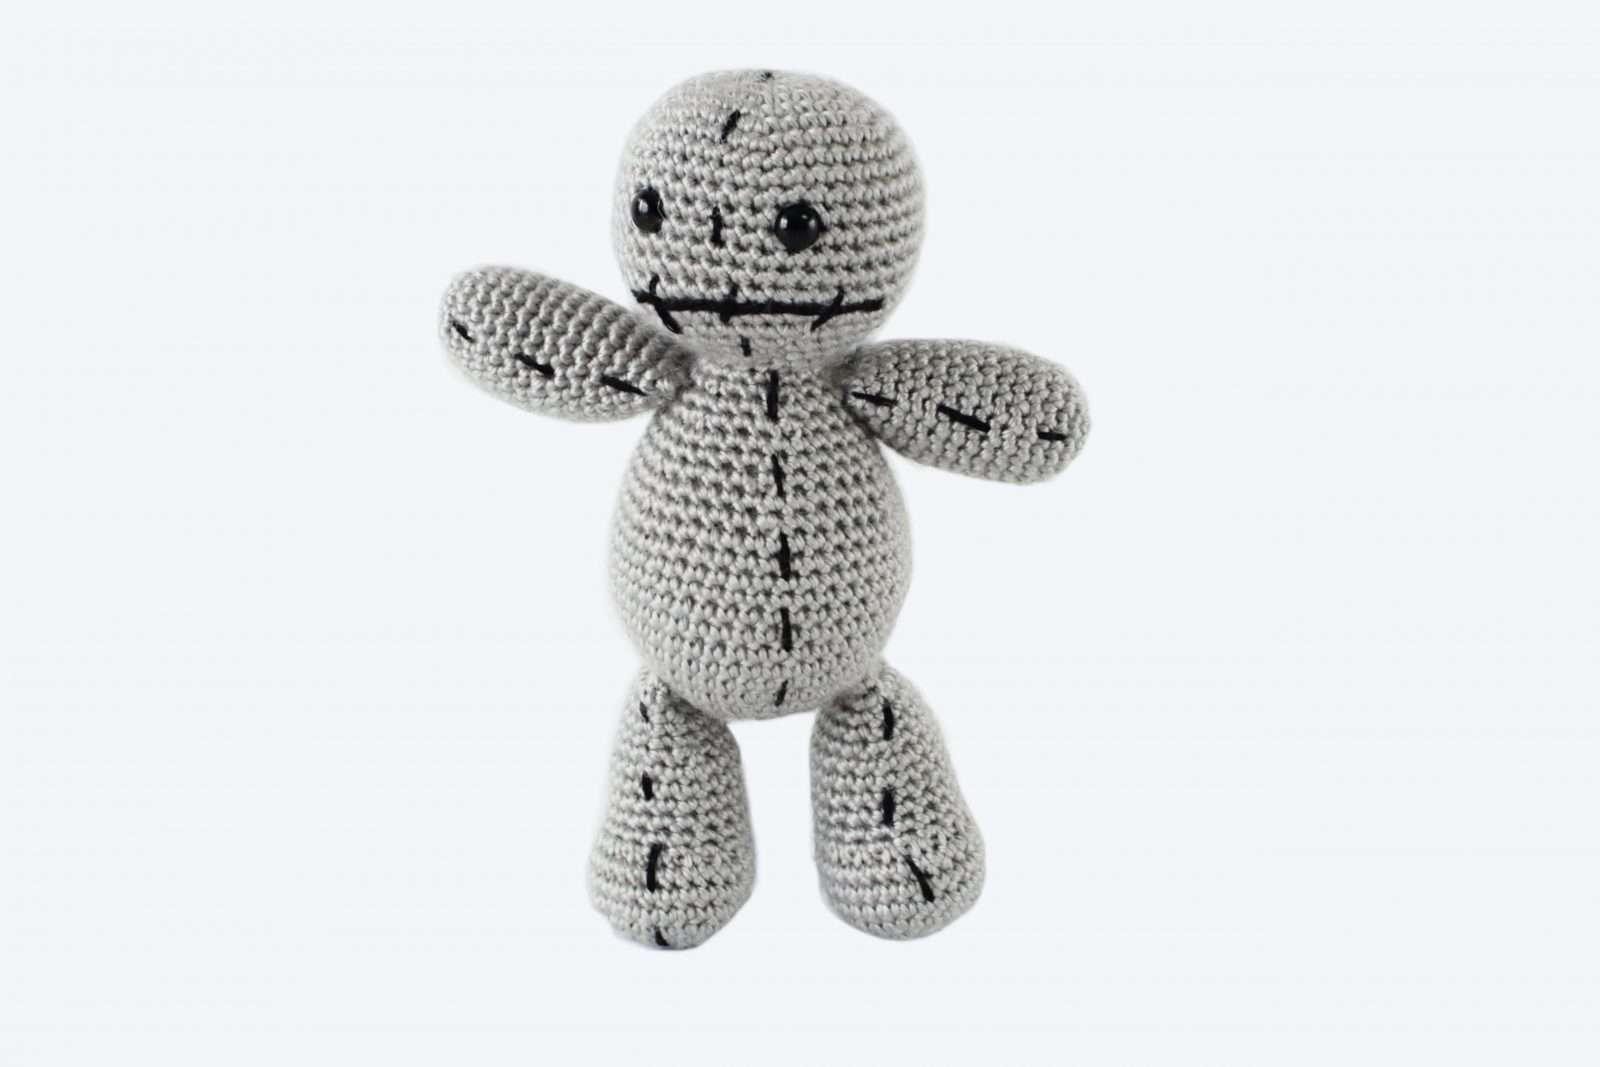 Amigurumi Voodoo Doll Free Pattern | Halloween crochet, Crochet ... | 1067x1600